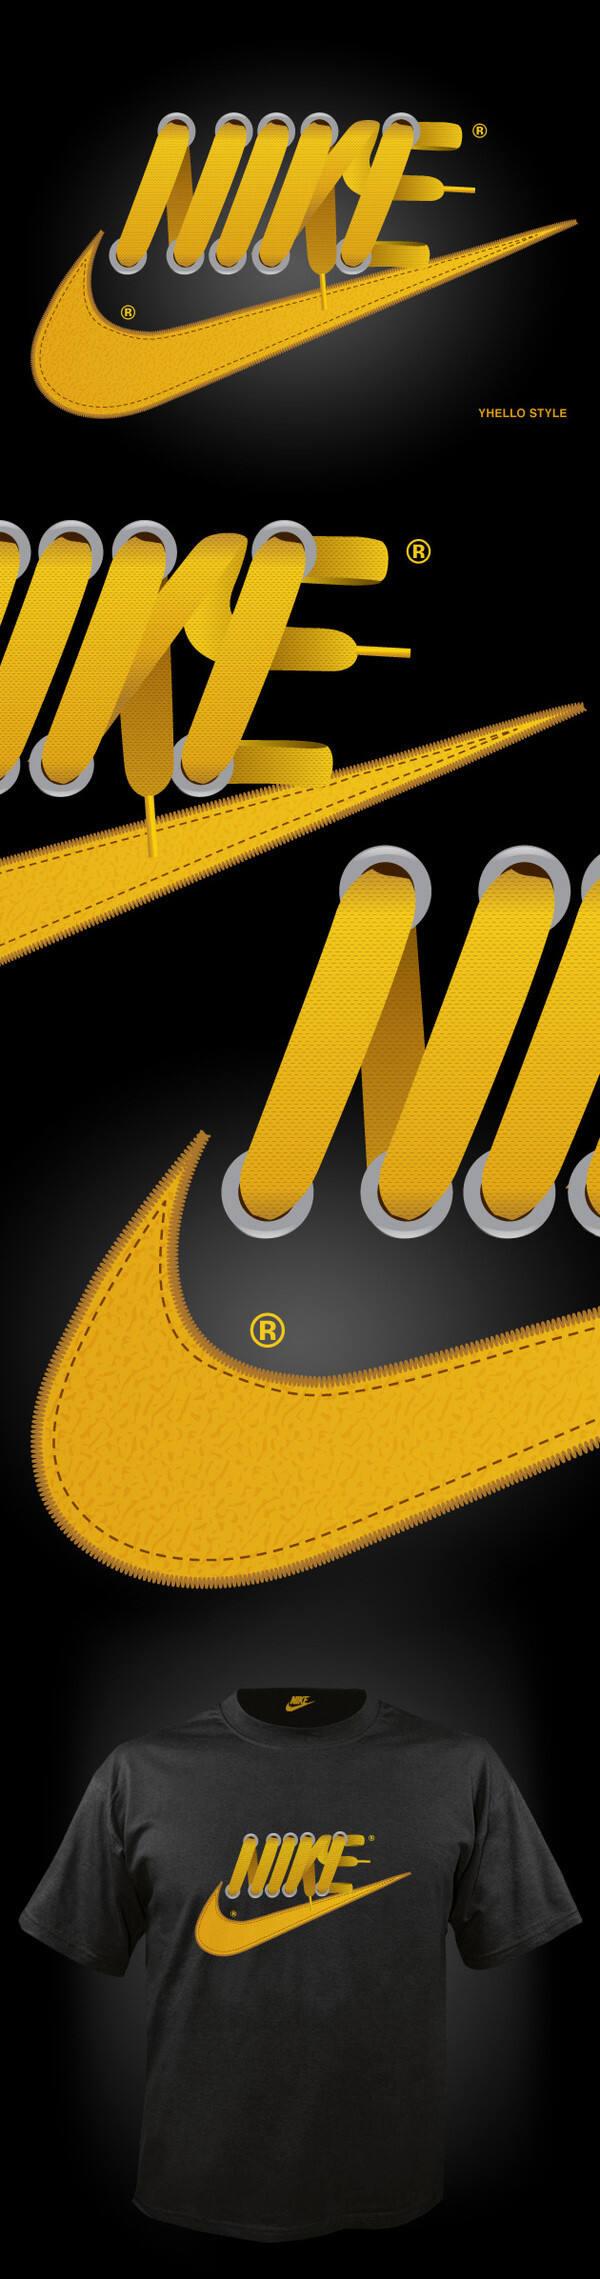 Nike Laces by Hugo Silva